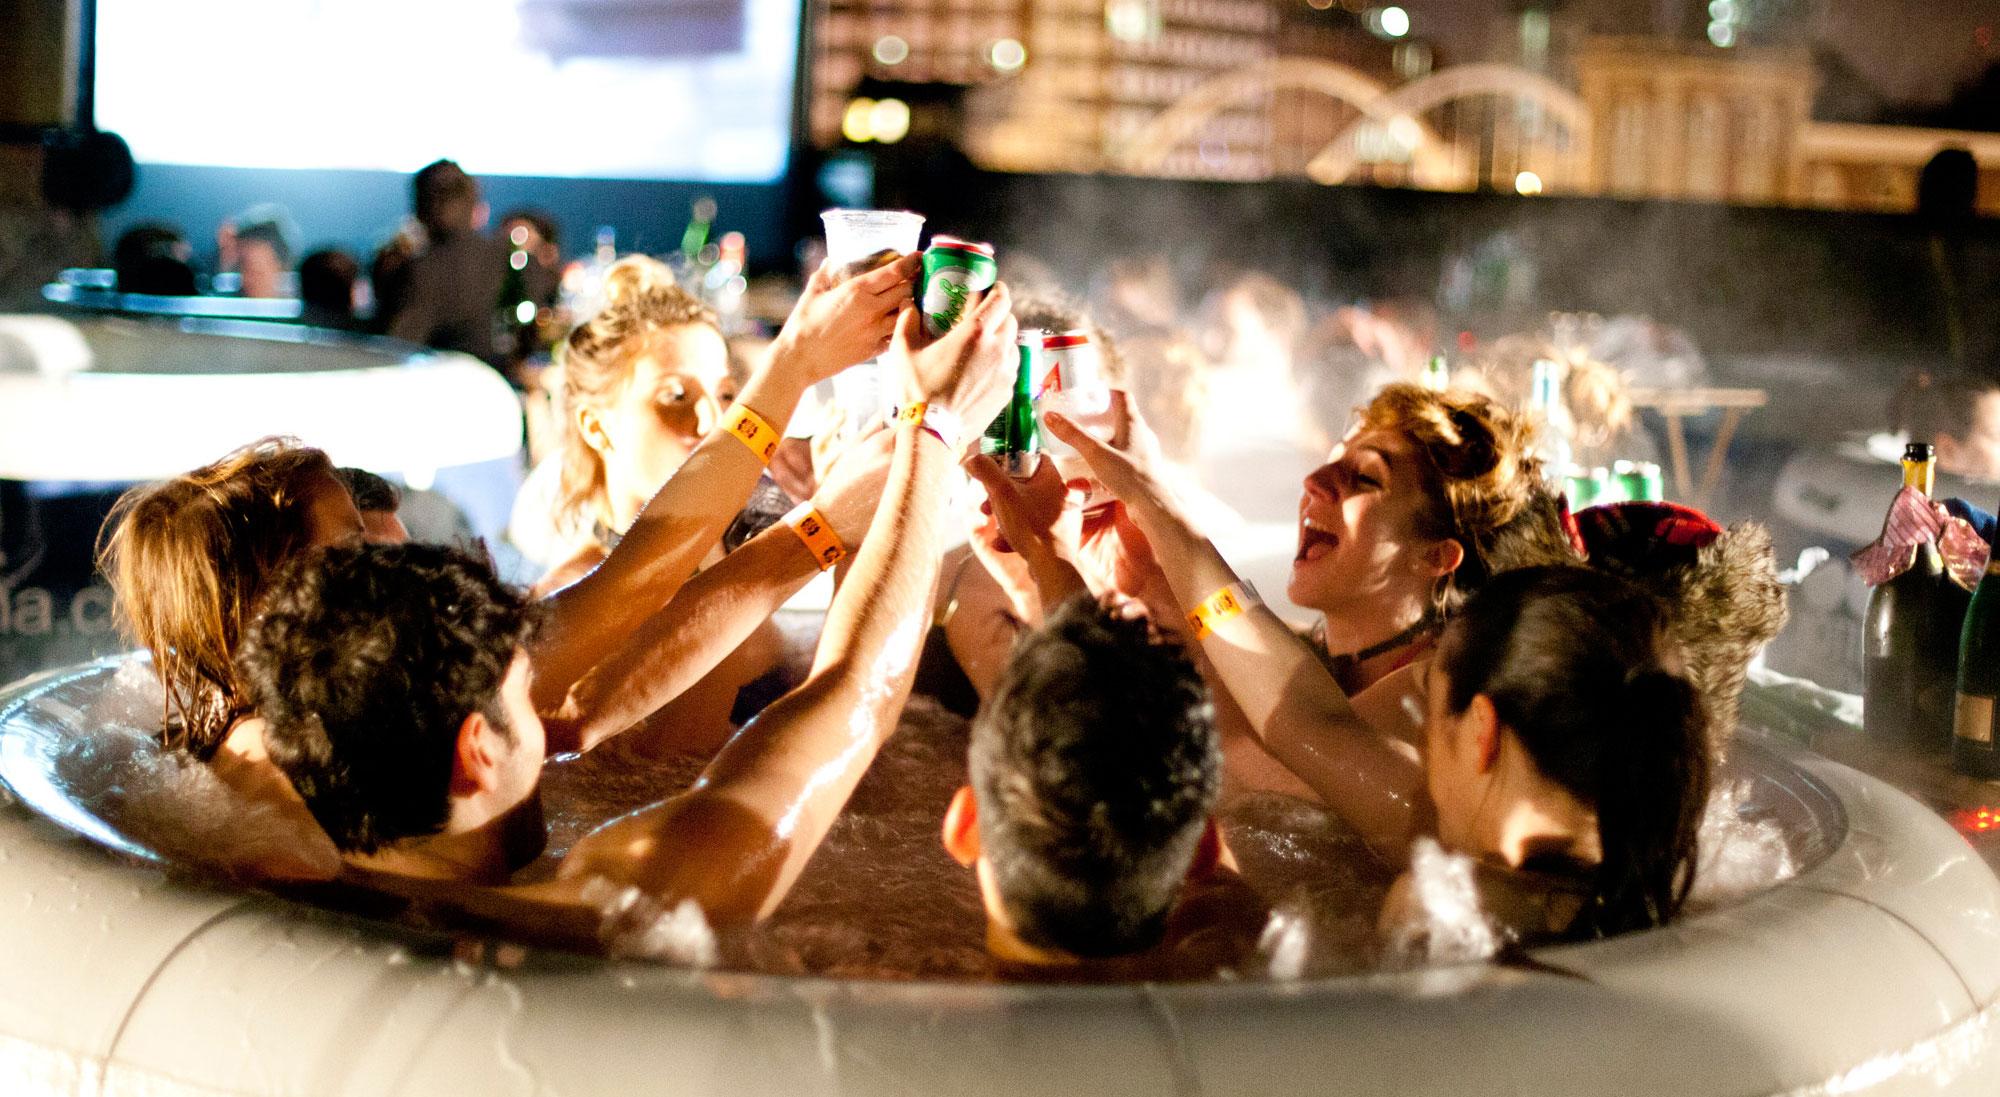 Hot Tub Party Fun!